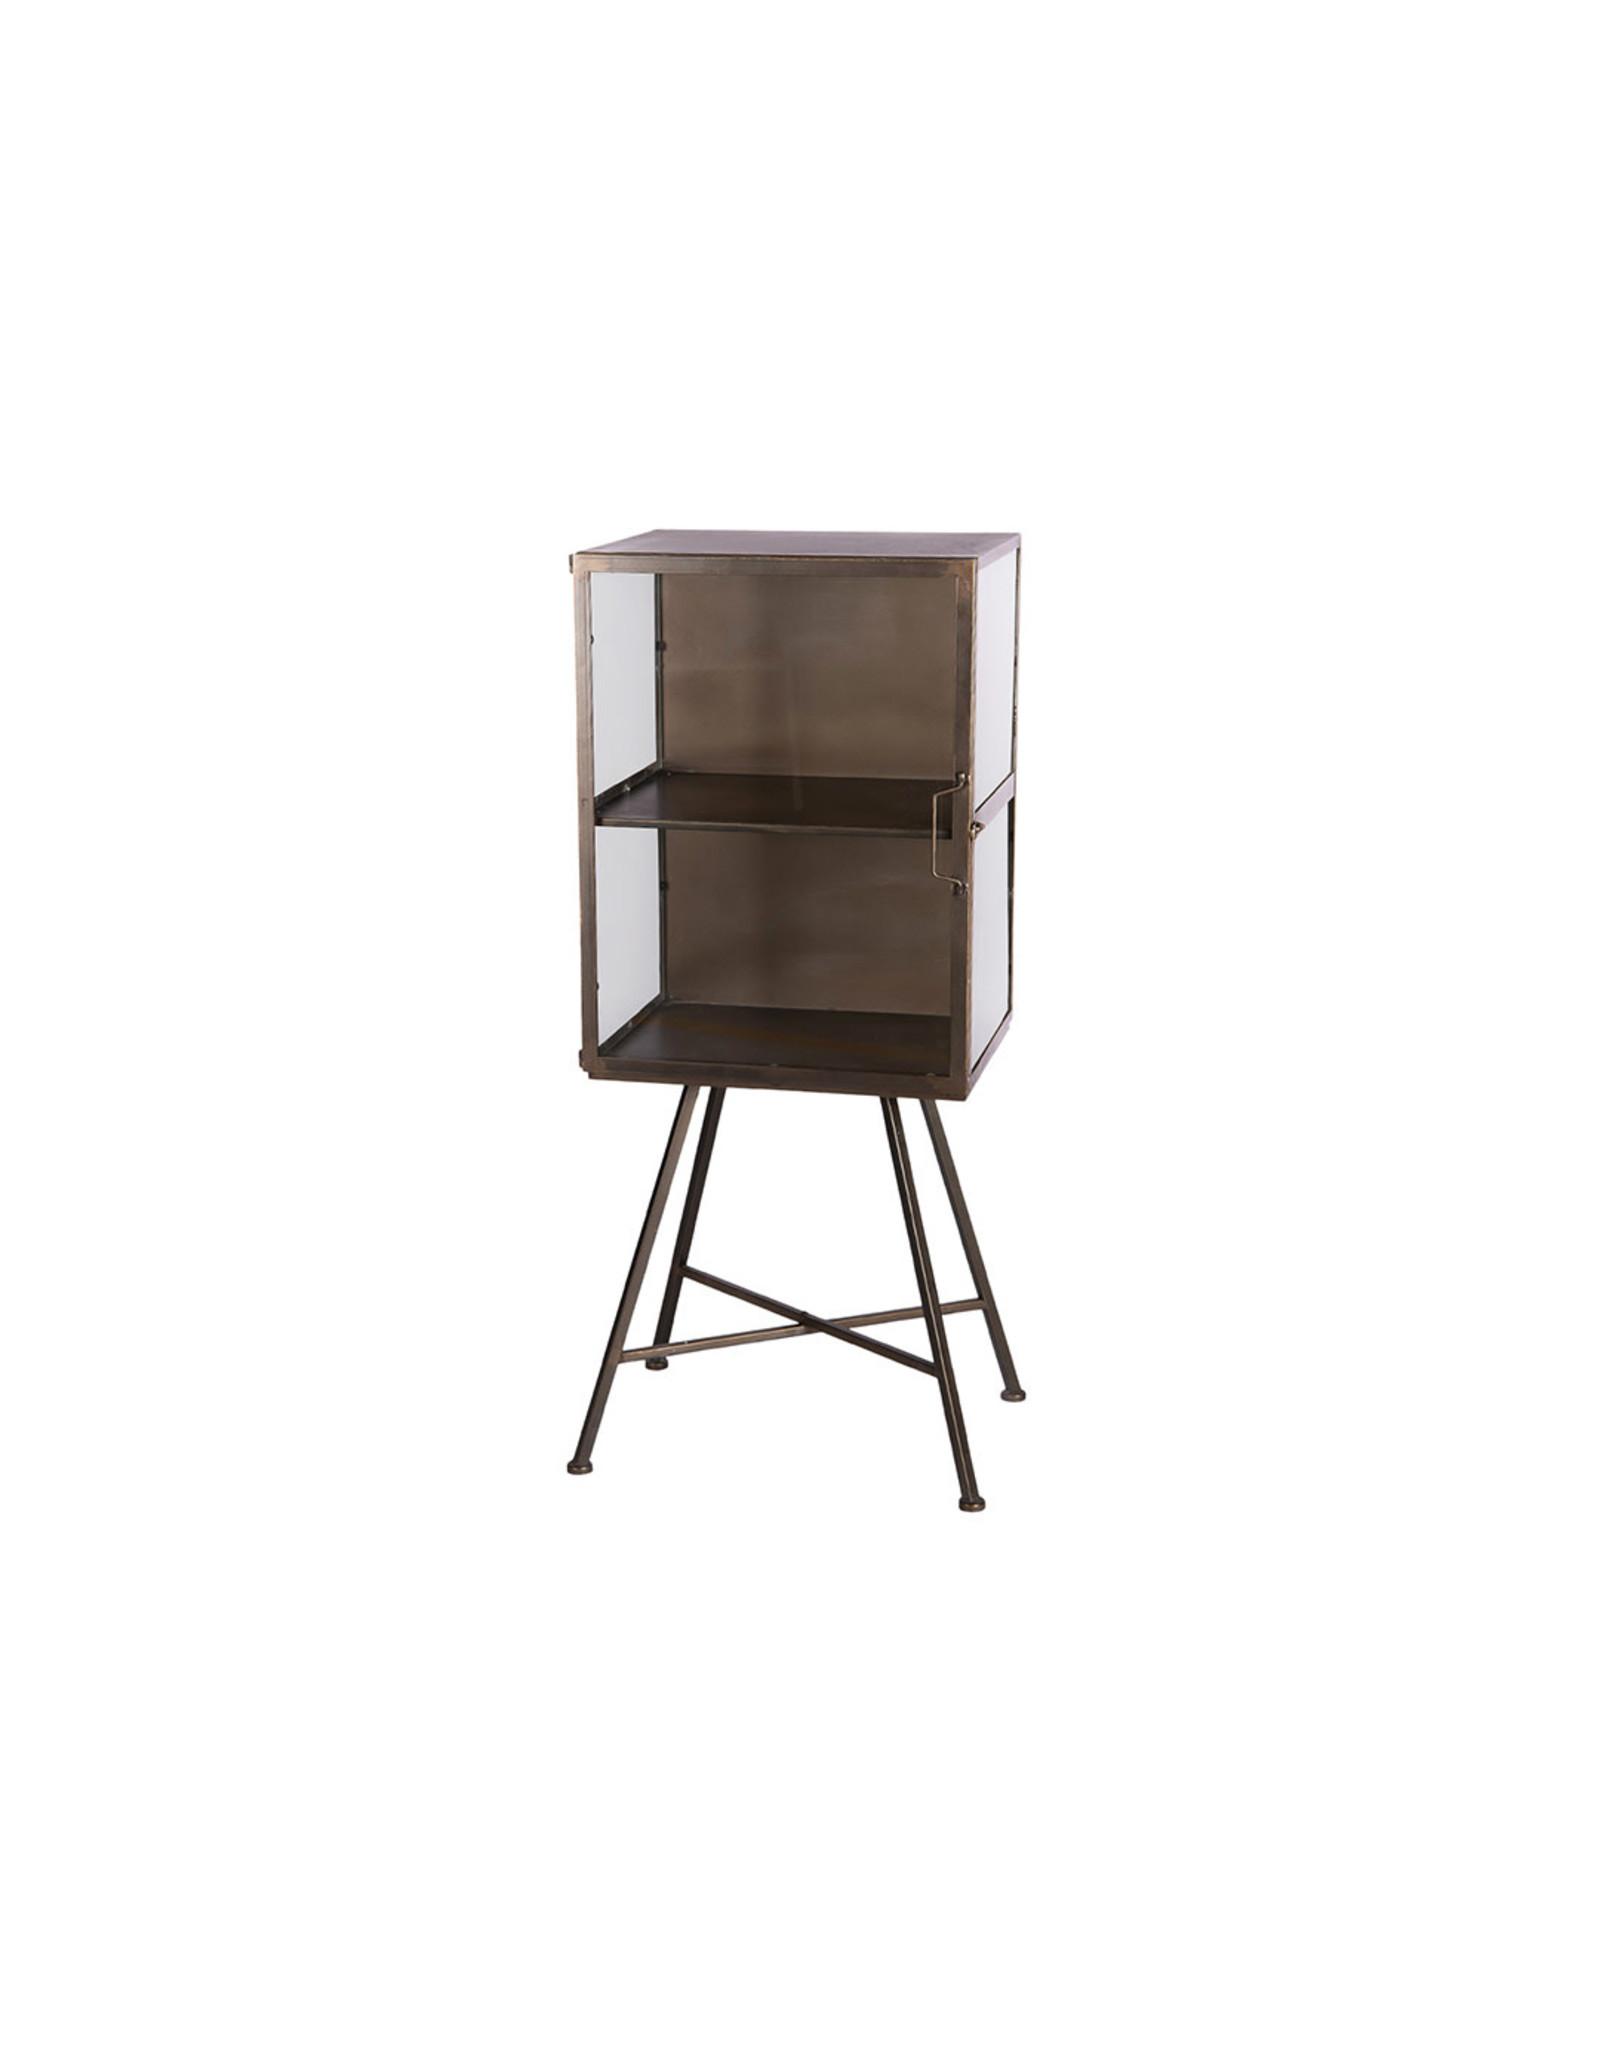 Dijk Cabinet metal antique black 46.5x37.5x110cm